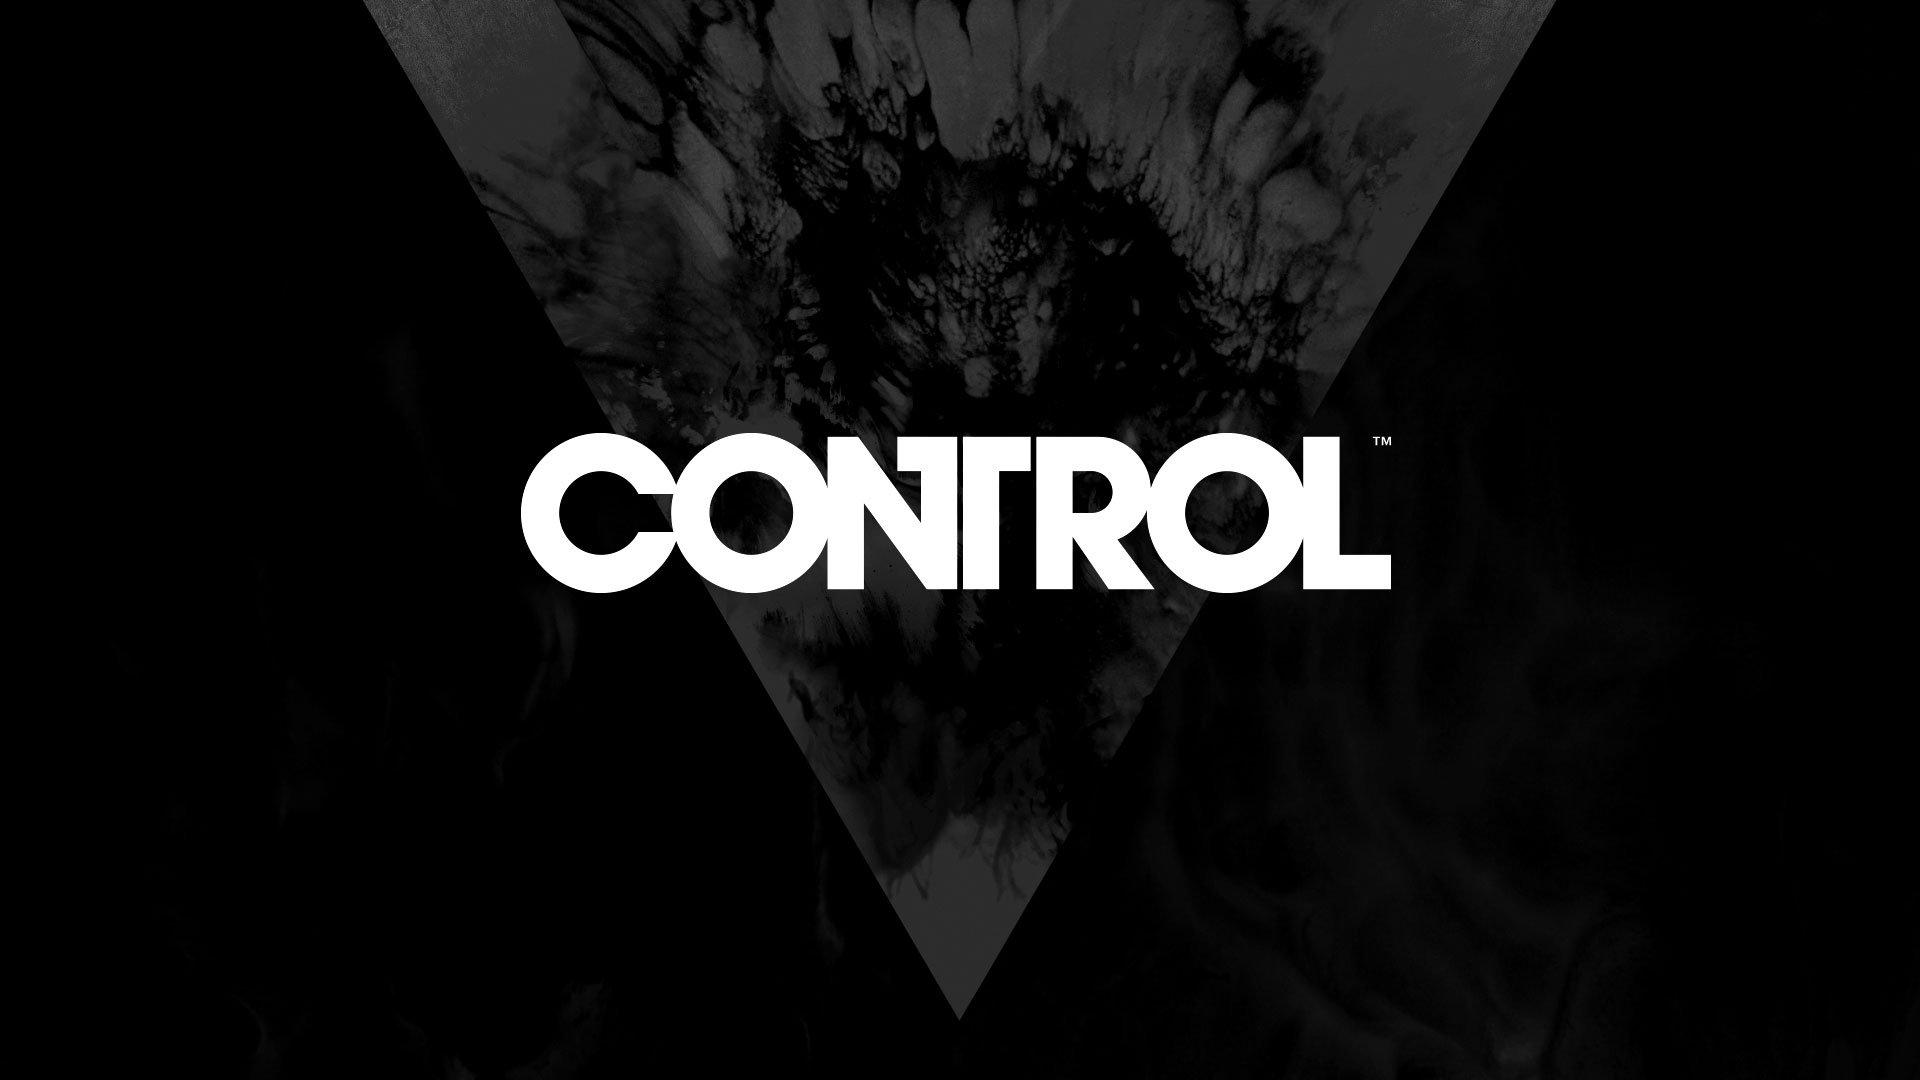 Control-logo-splash-screen.jpg